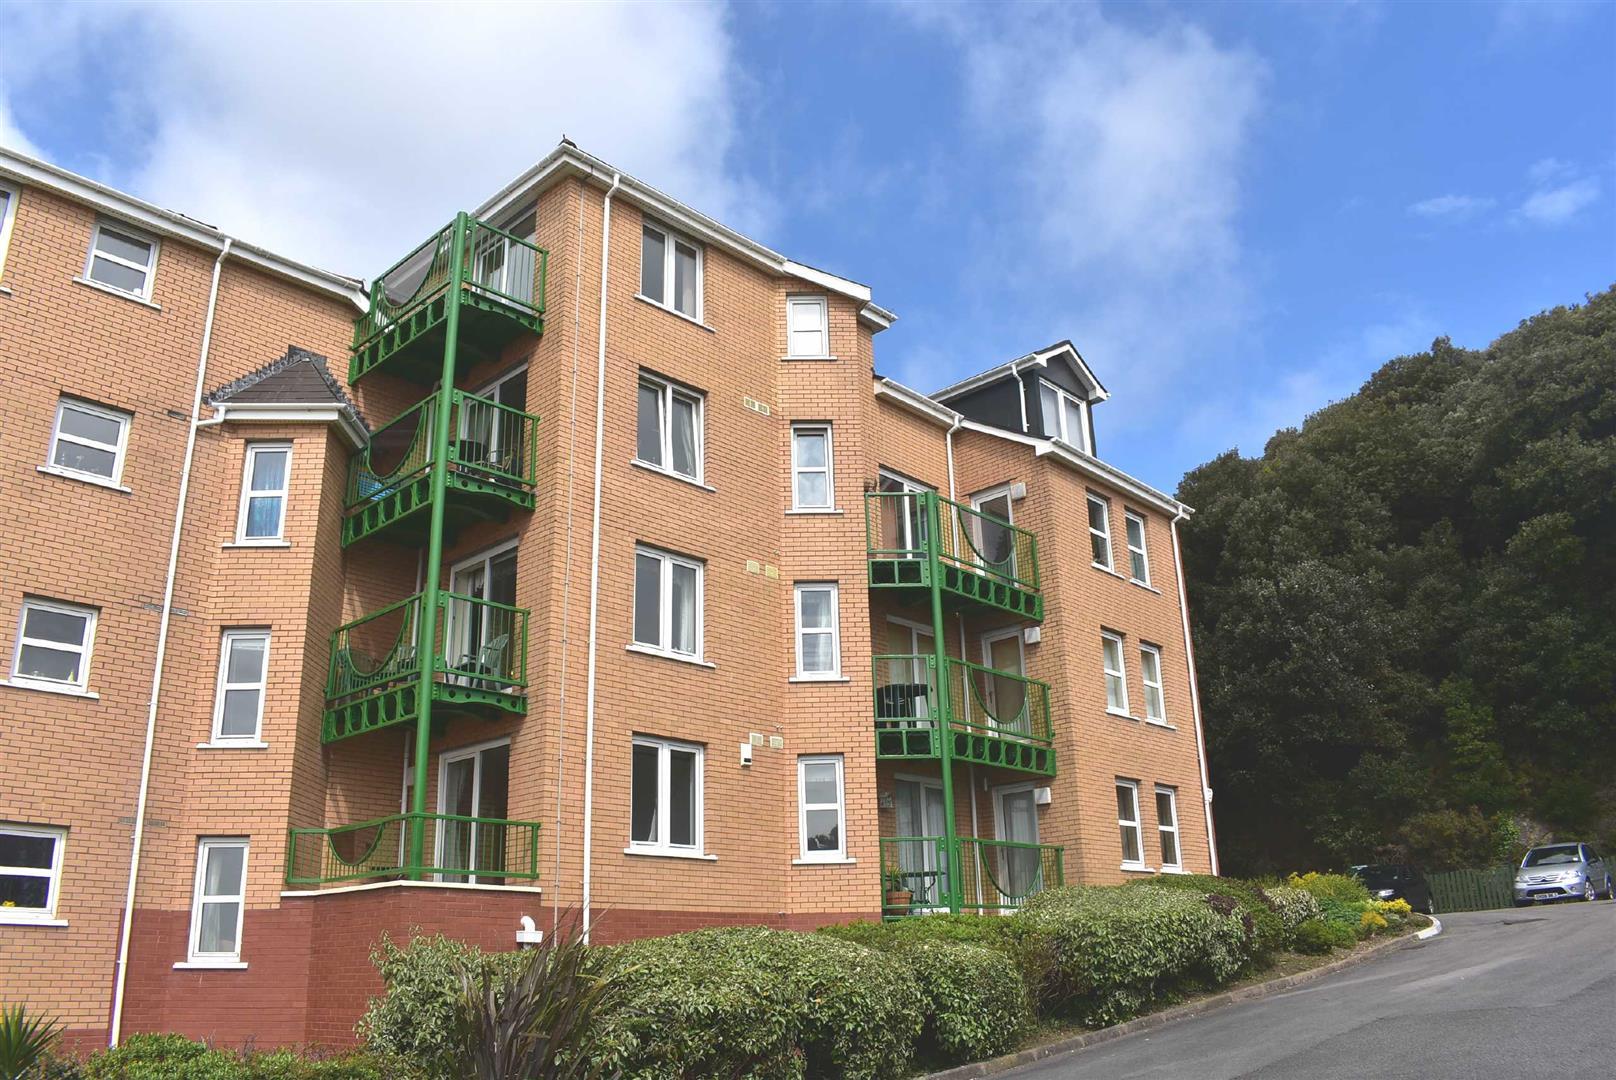 Caswell Bay Court, Caswell, SA3 4RY